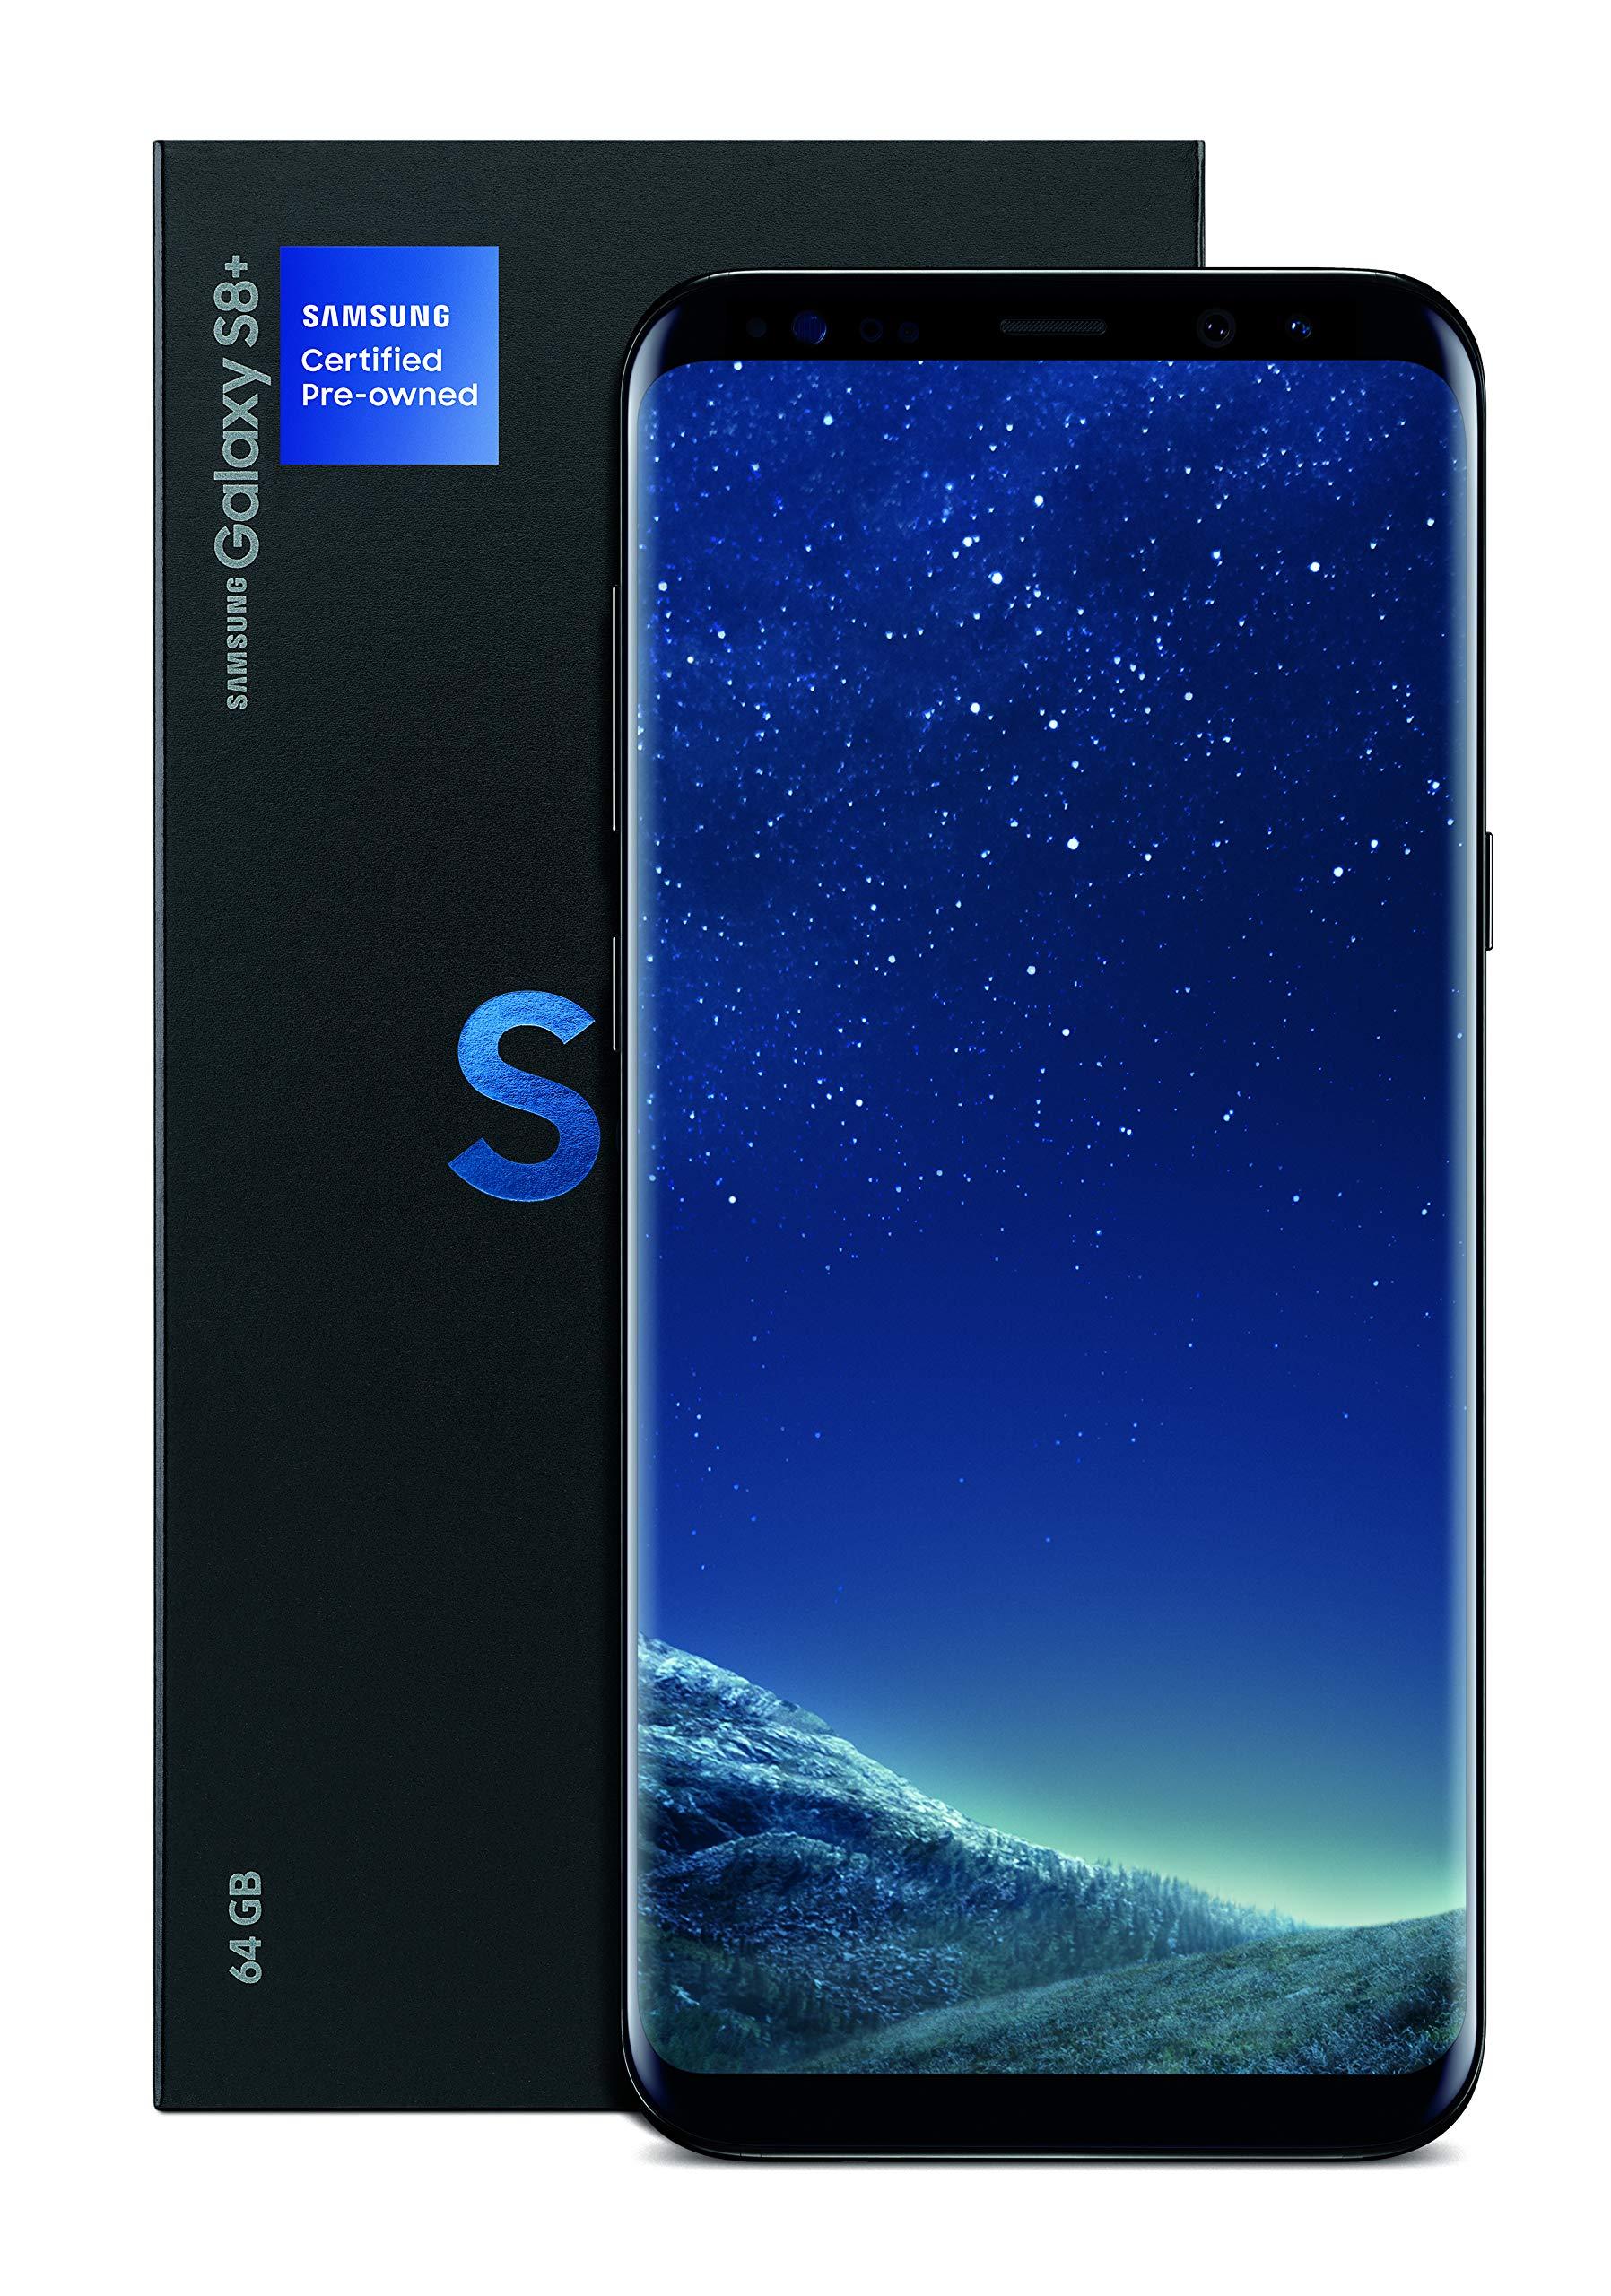 Samsung Galaxy S8+ Certified Pre-Owned Factory Unlocked Phone - 6.2Inch Screen - 64GB - Midnight Black (U.S. Warranty) (Renewed)